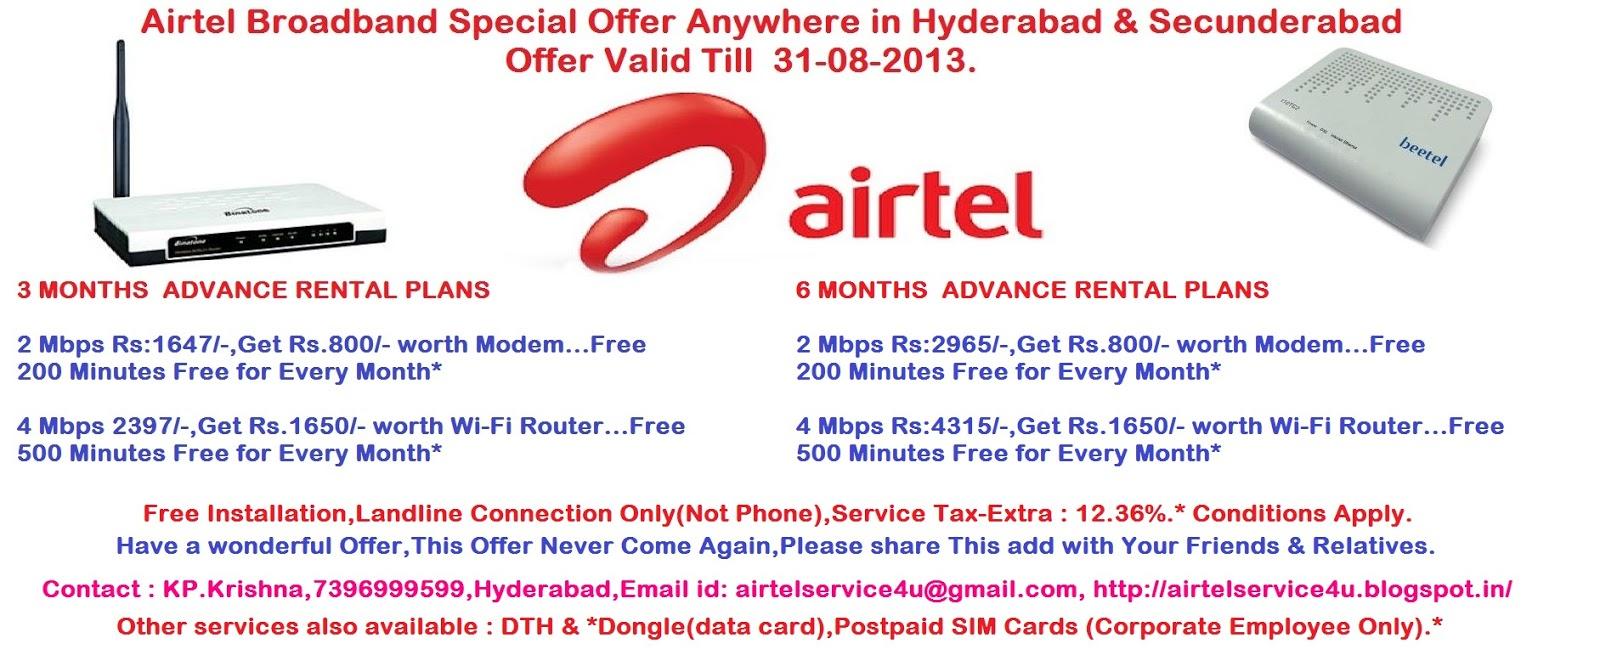 Airtel Broadband Connection Number Hyderabad - Best